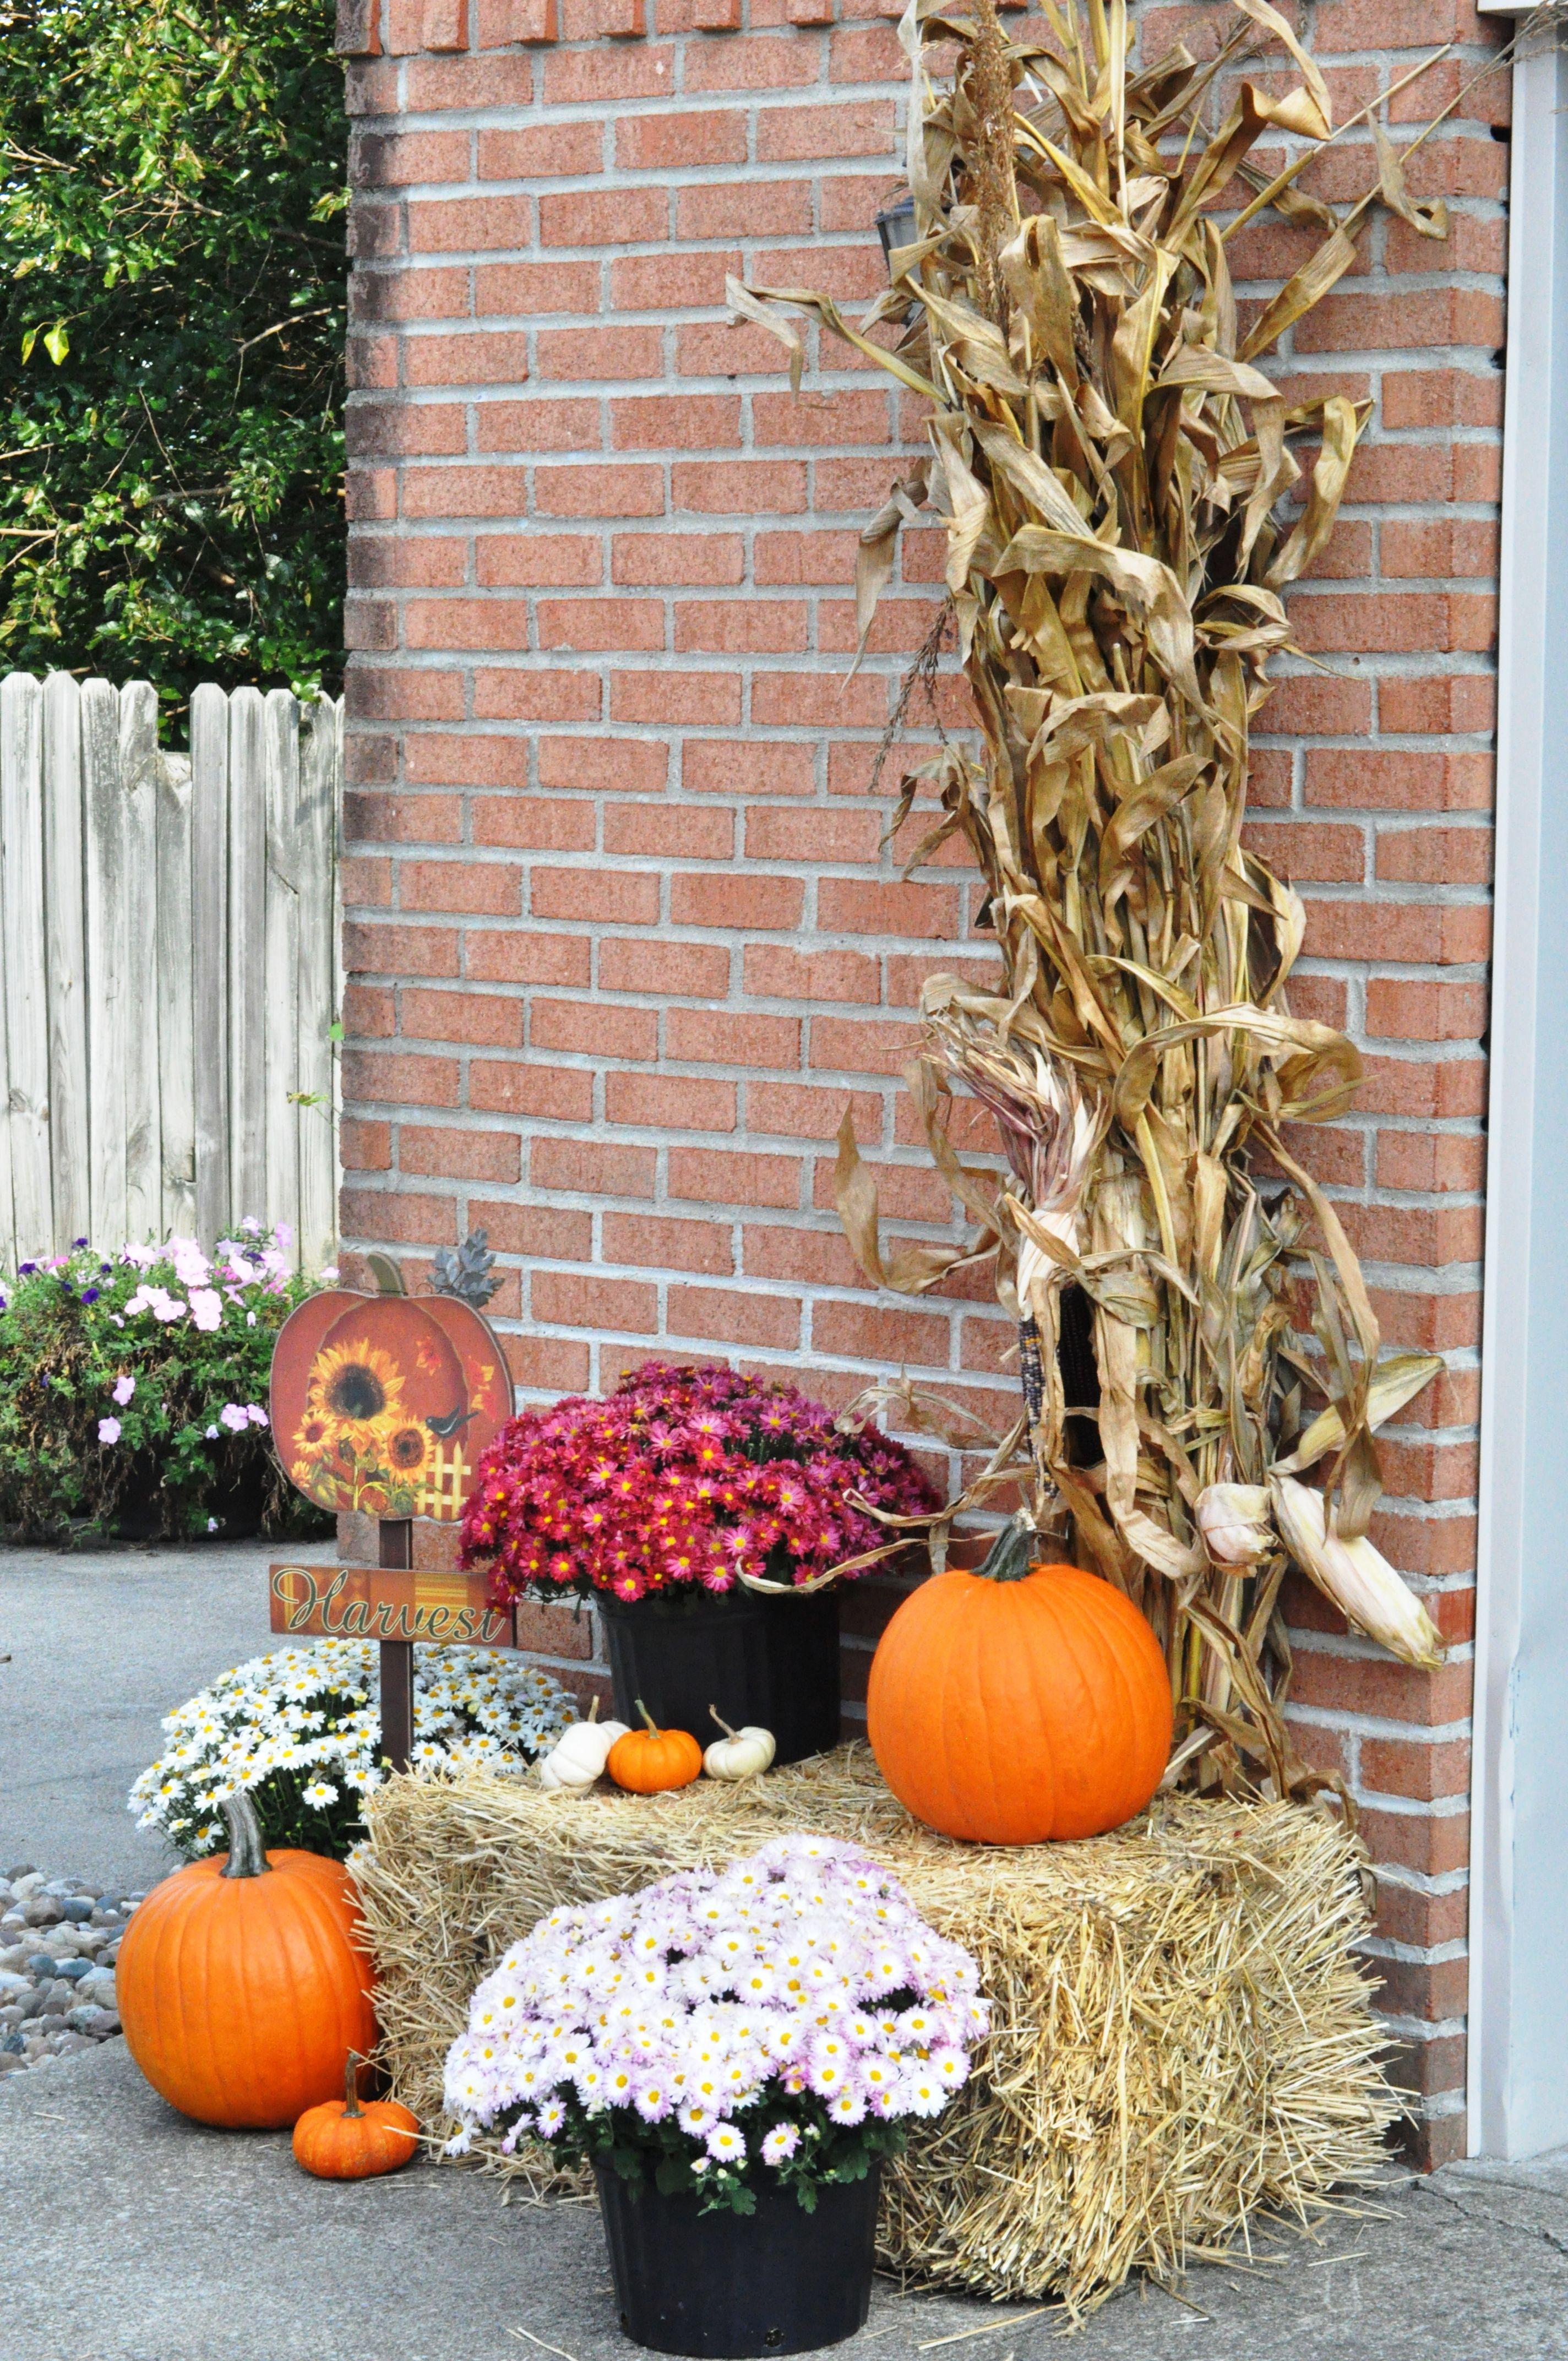 Outdoor fall decor - mums, hay bale, pumpkins, Harvest sign, corn ...